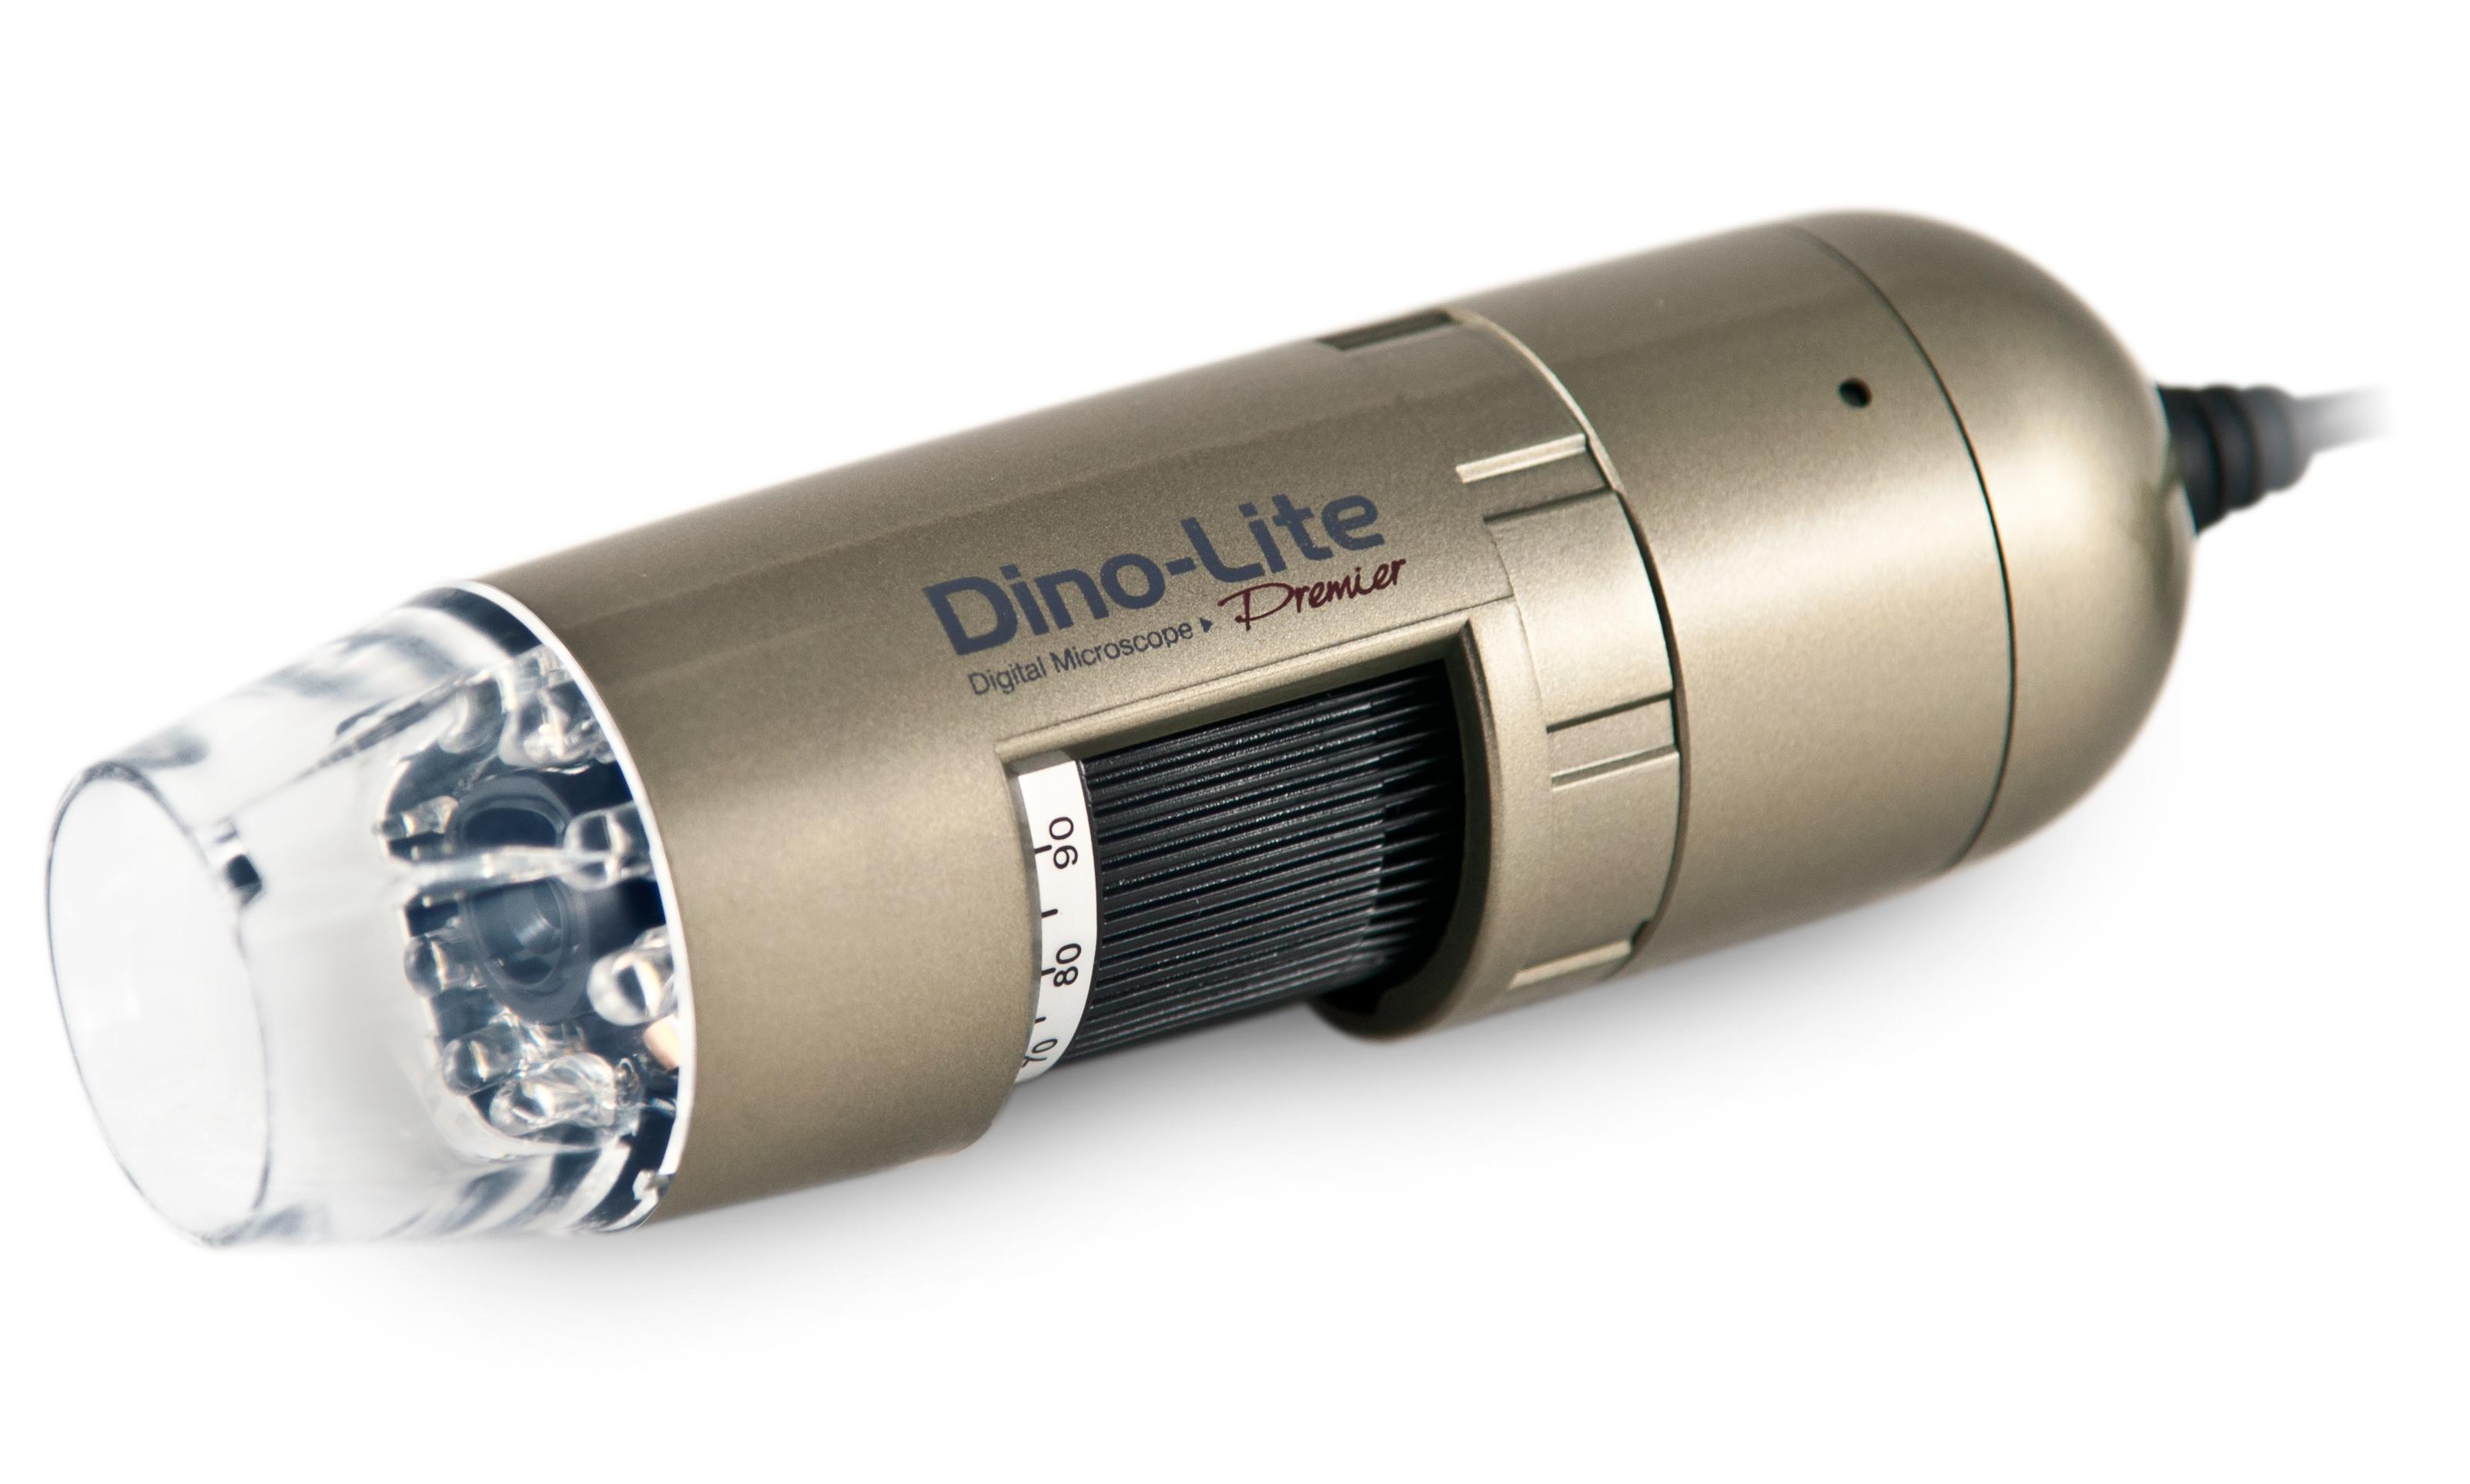 Capillaryscope capilaroscopia usb digitální mikroskop led mp